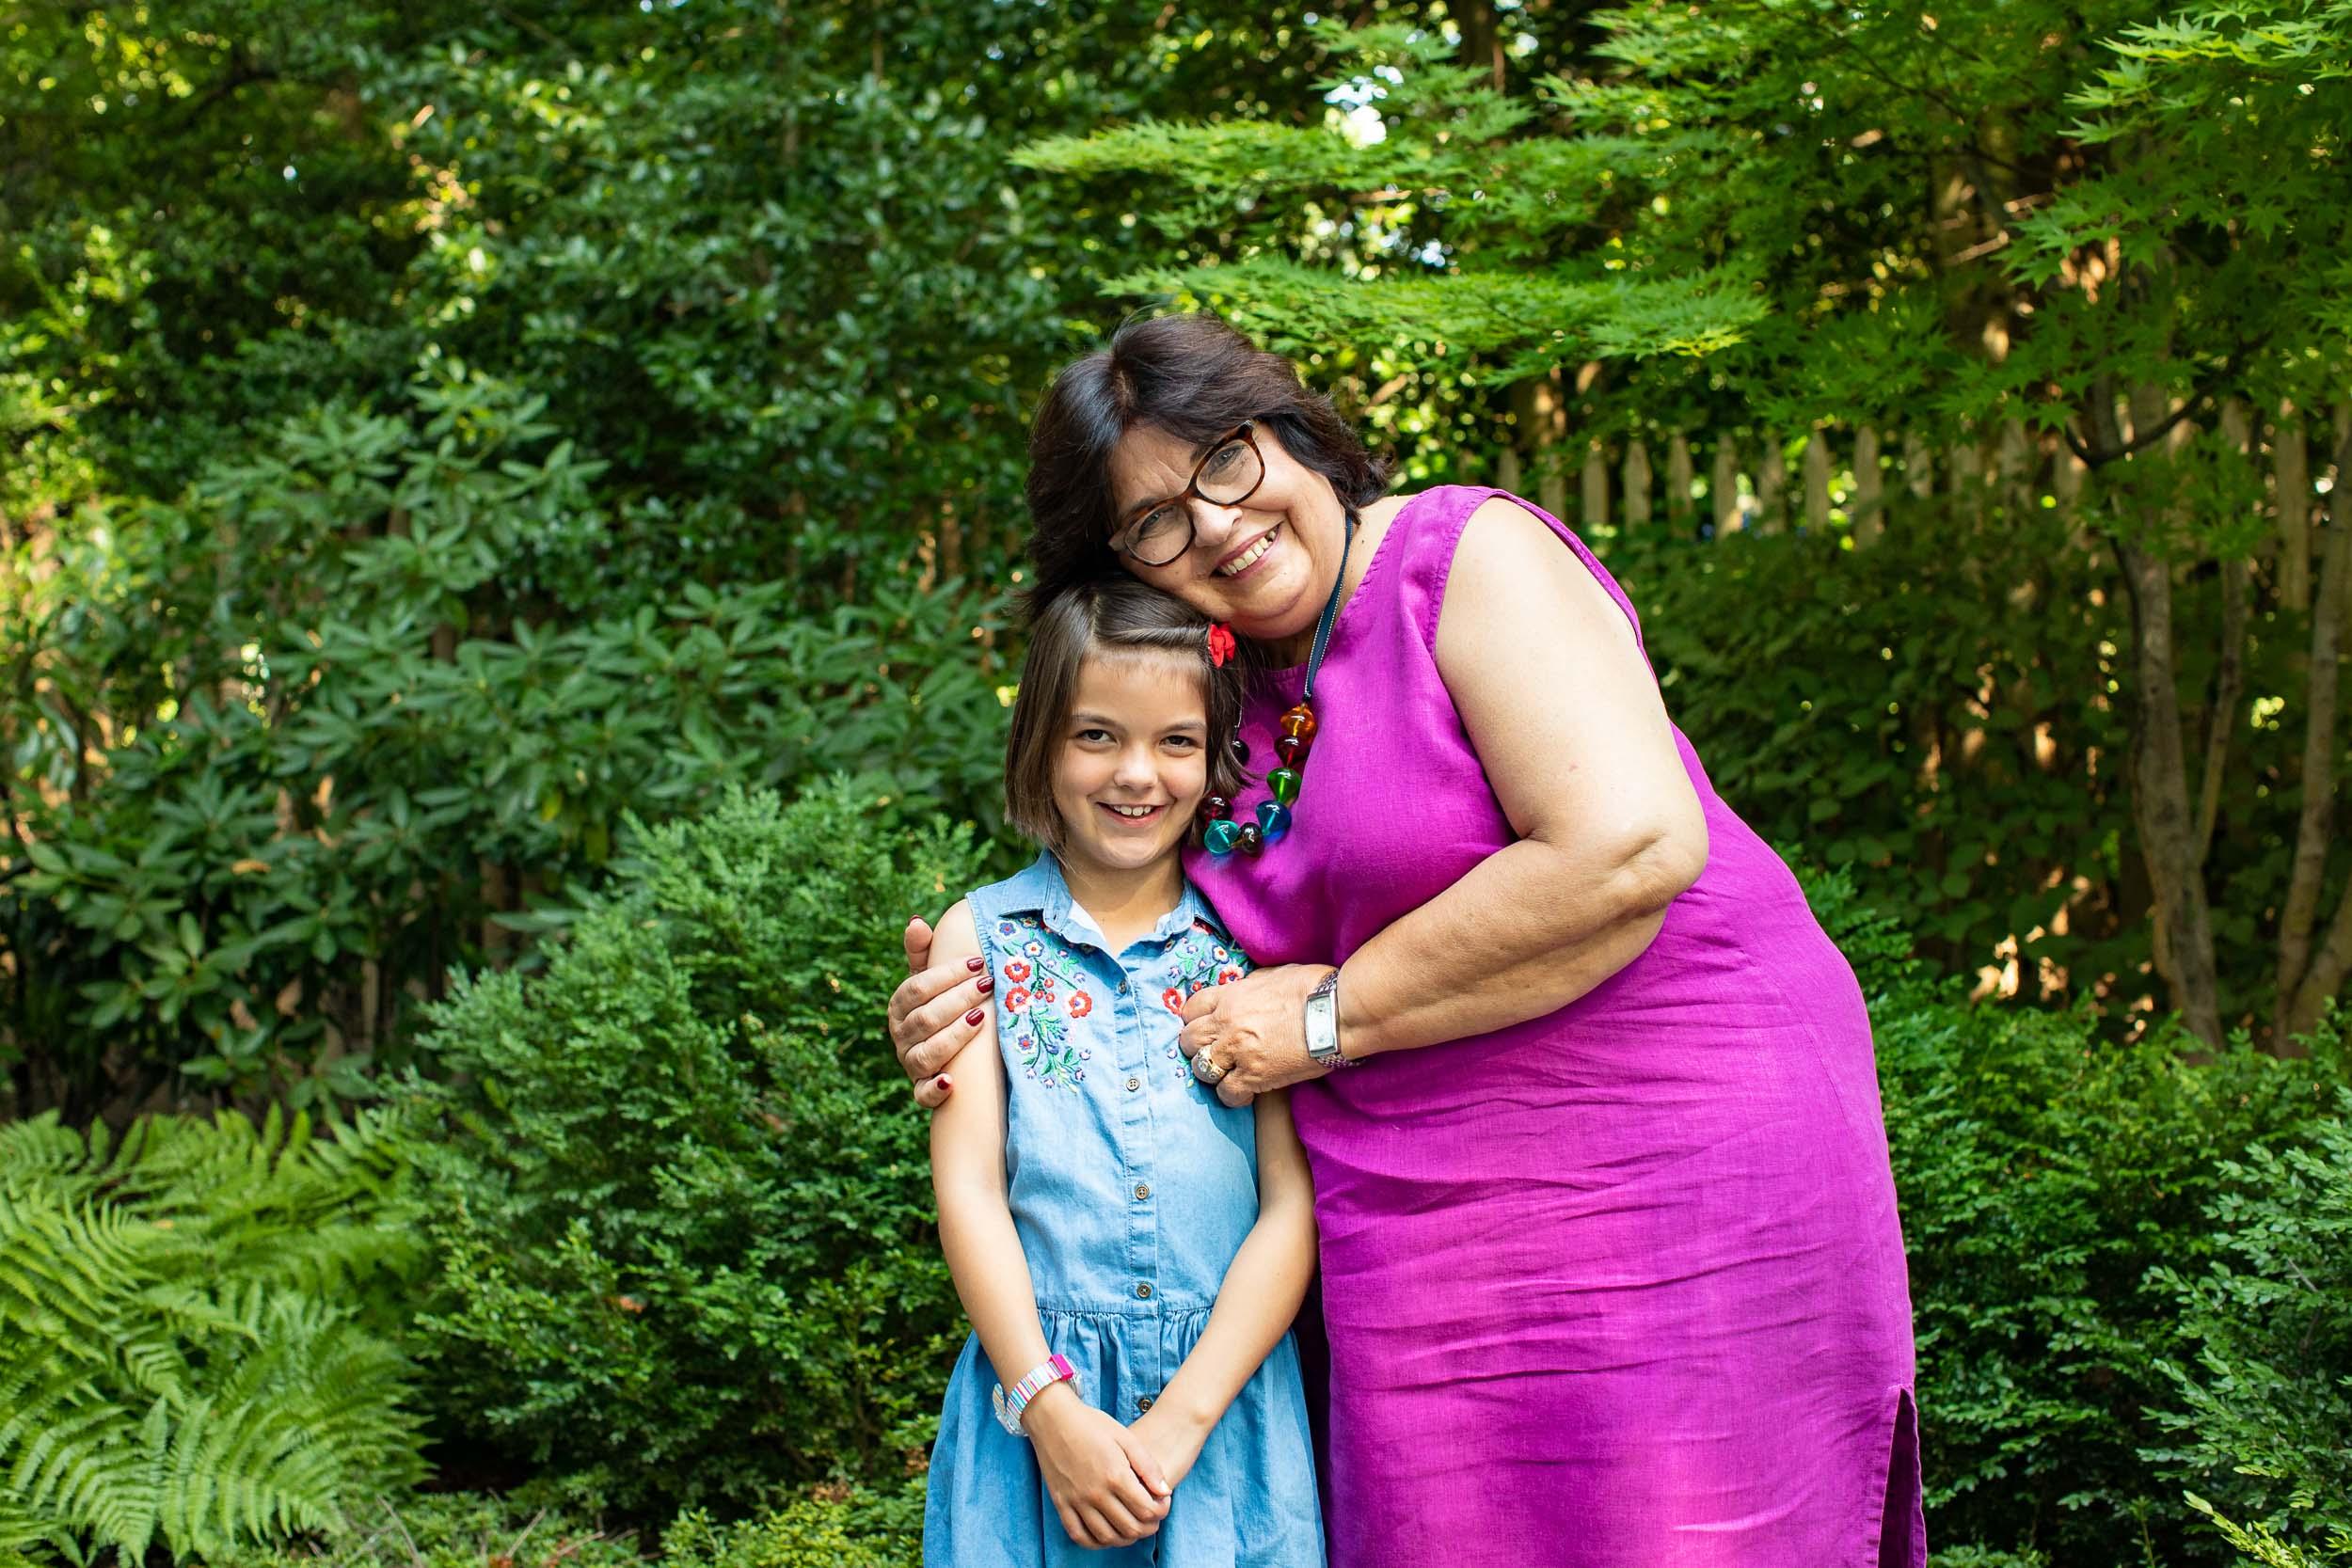 Chevy Chase MD Backyard Family Portraits Maryland Photography Tara Parekh Photography -07.jpg